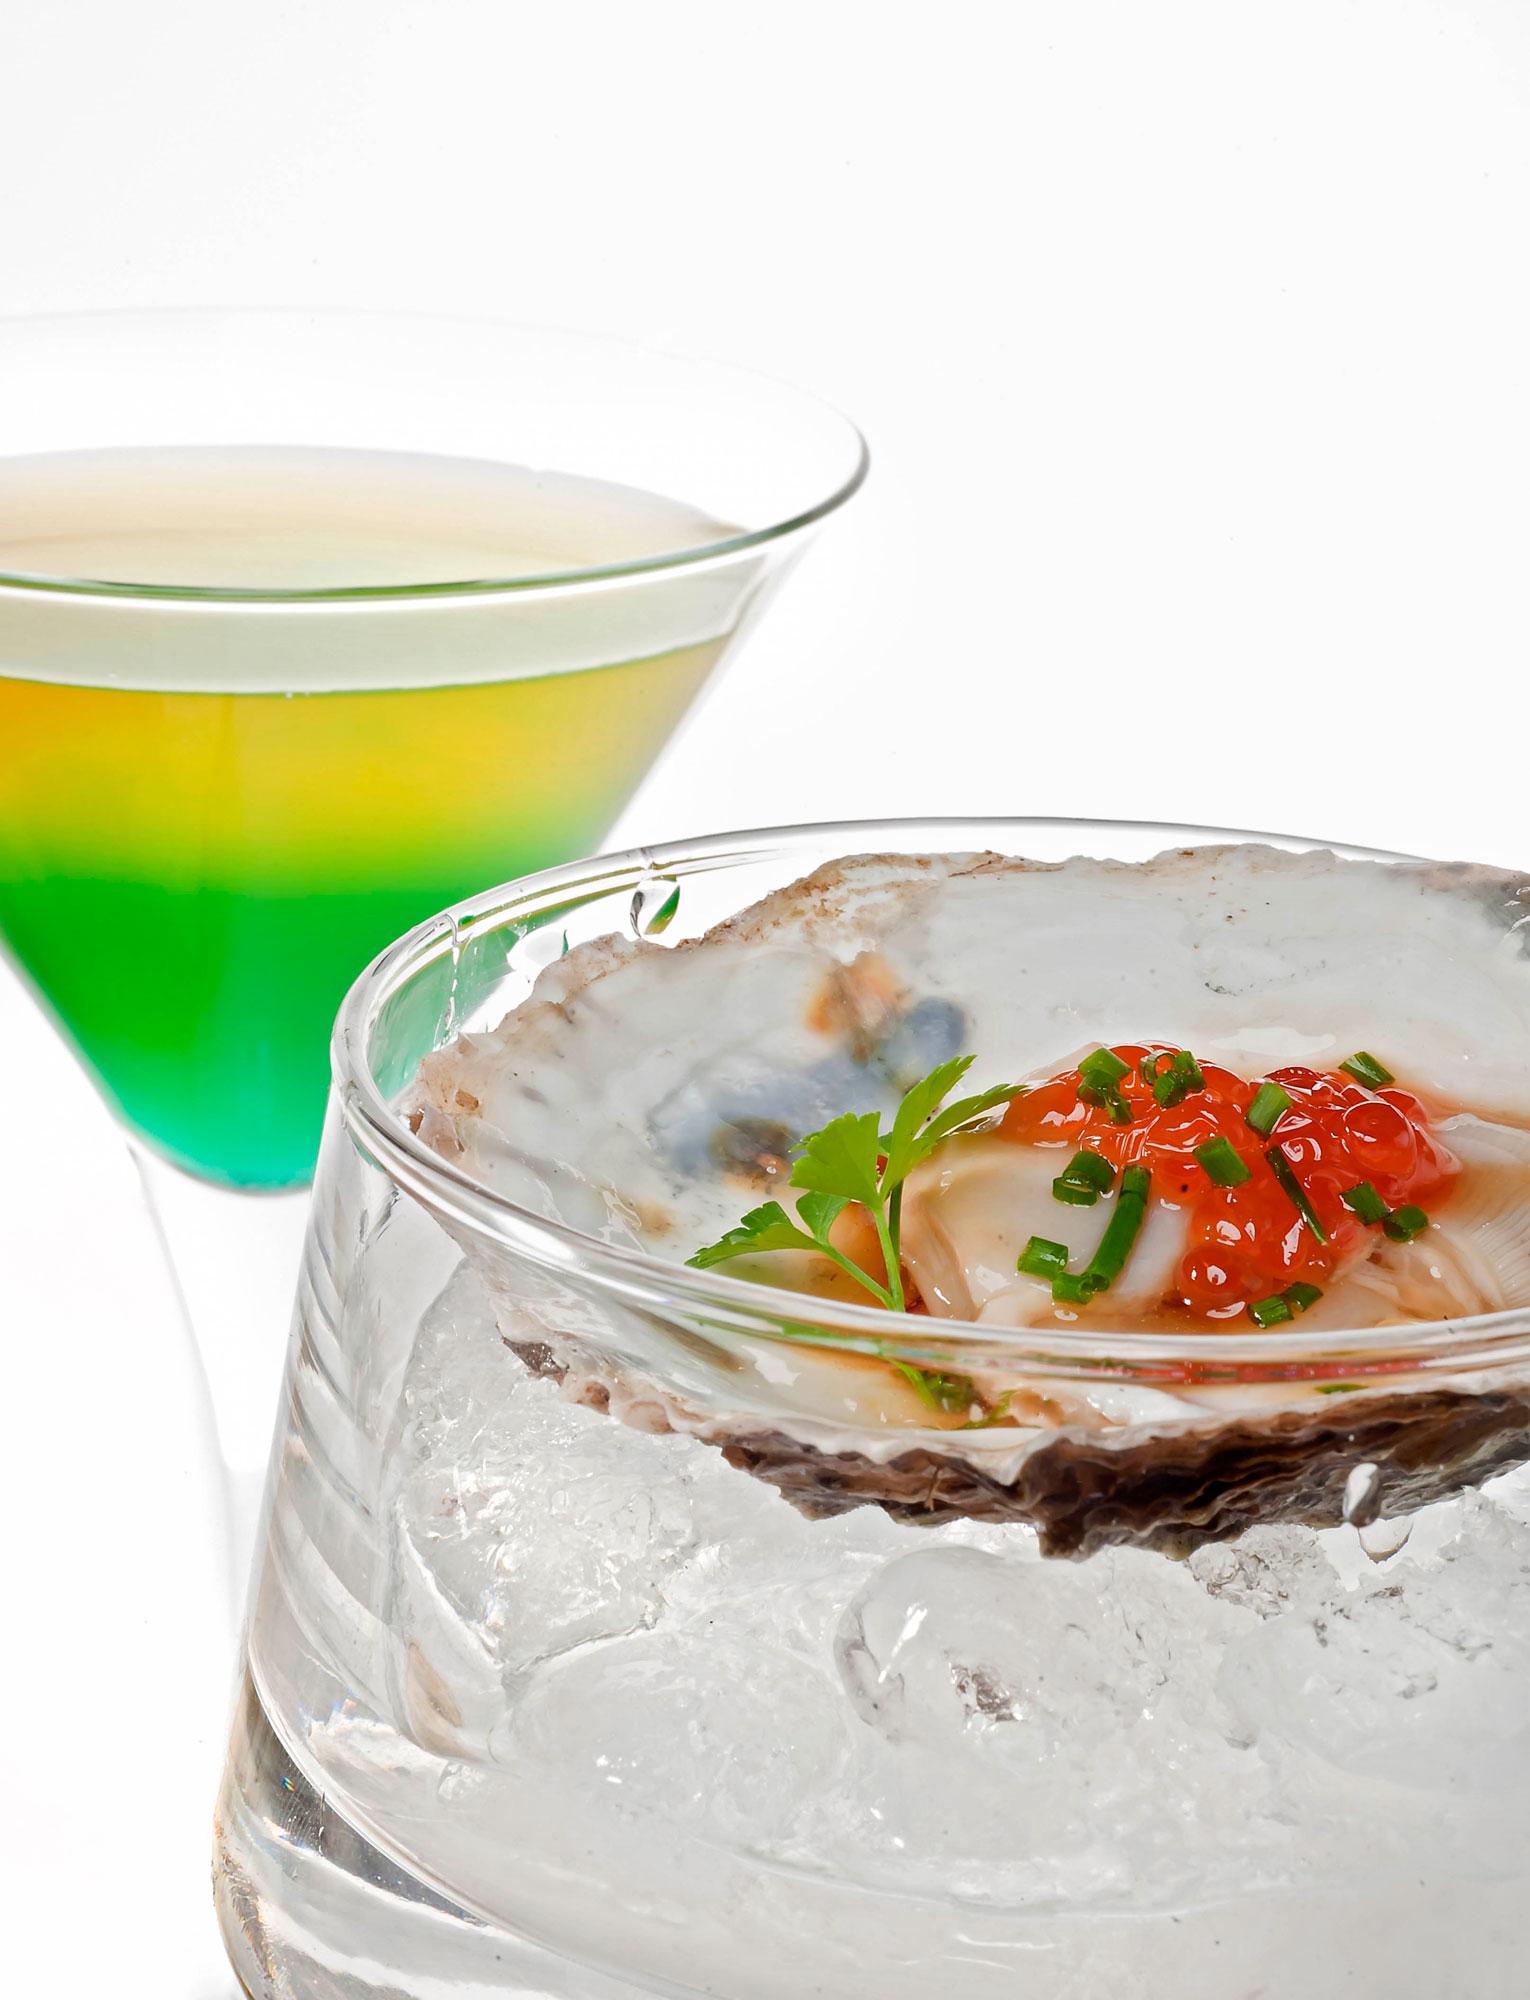 Ostras marinadas y cóctel Oyster Special - Detalle